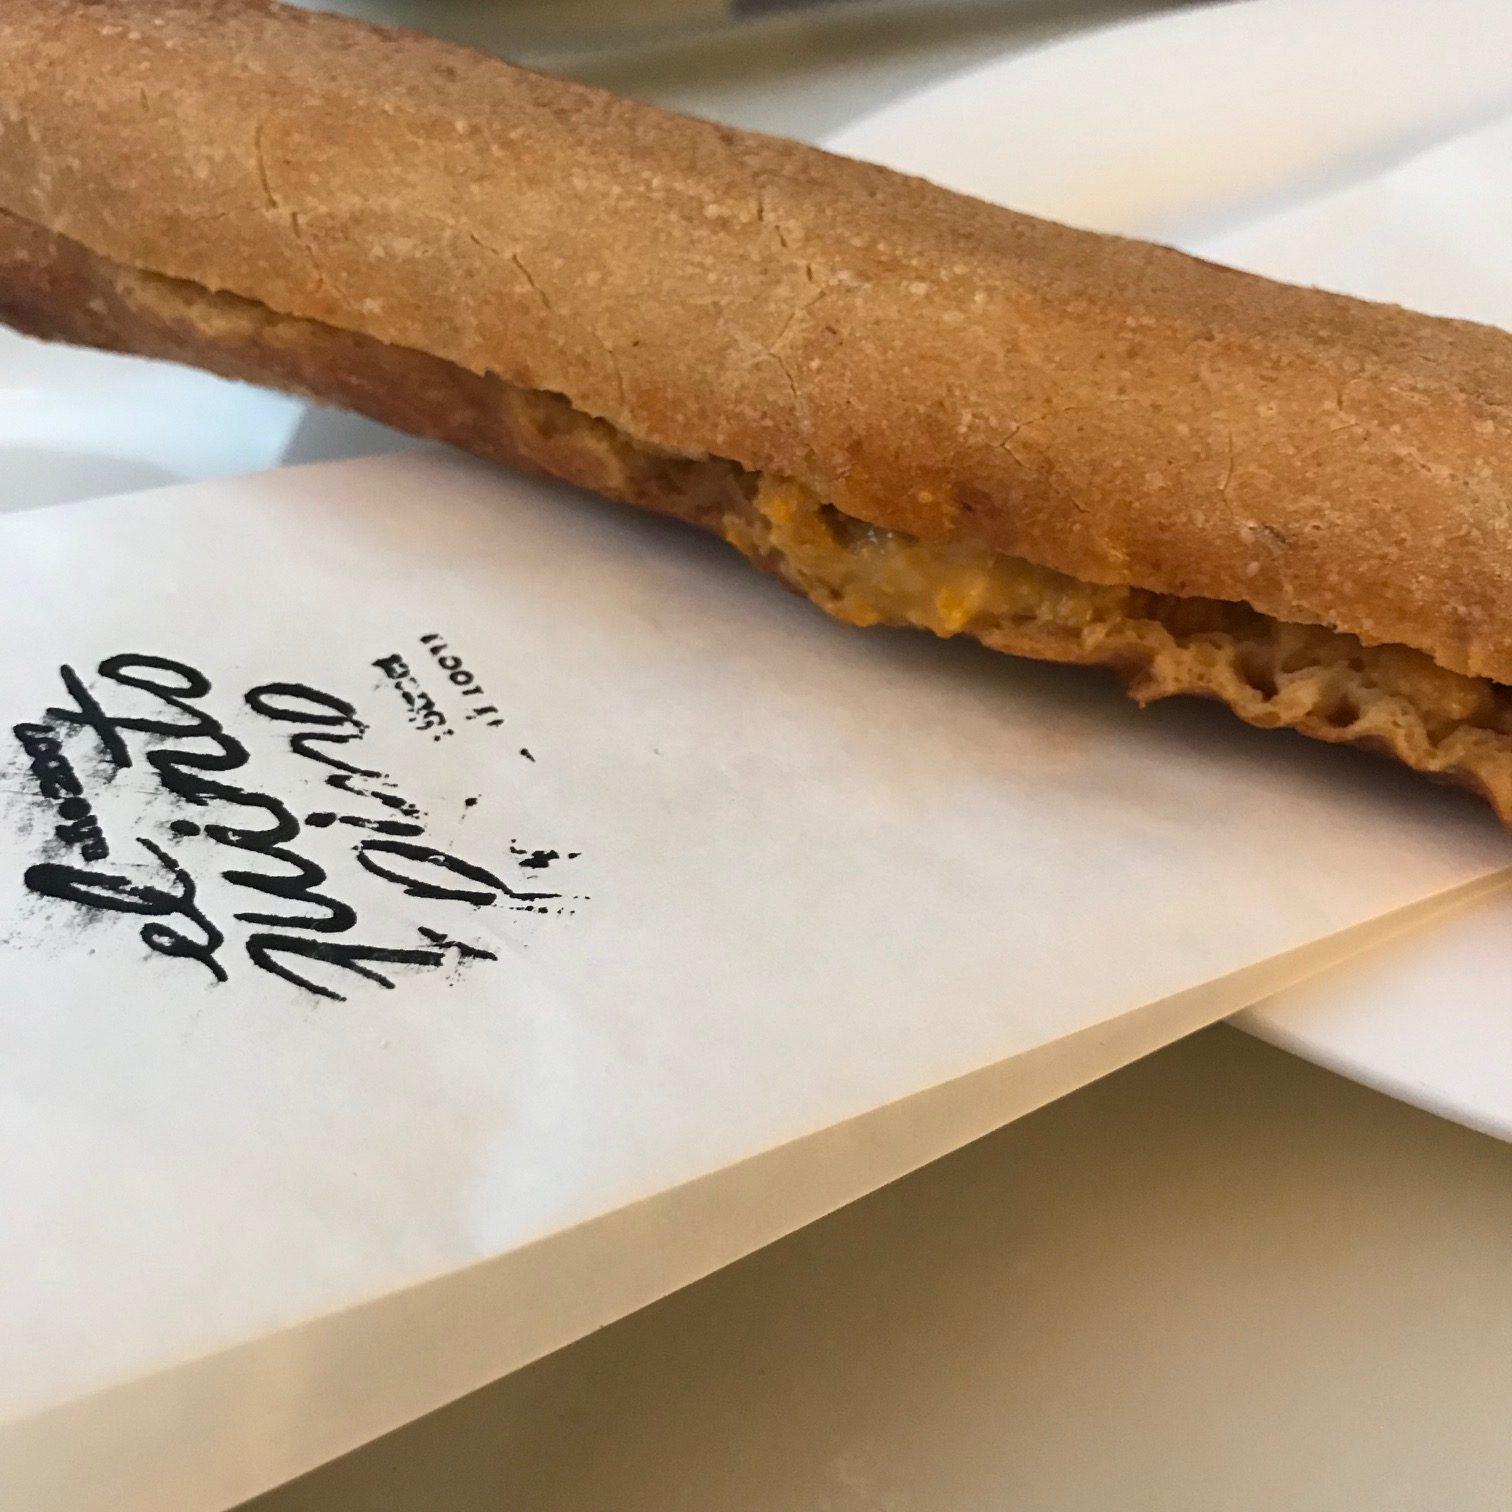 Saluting The Sandwich…